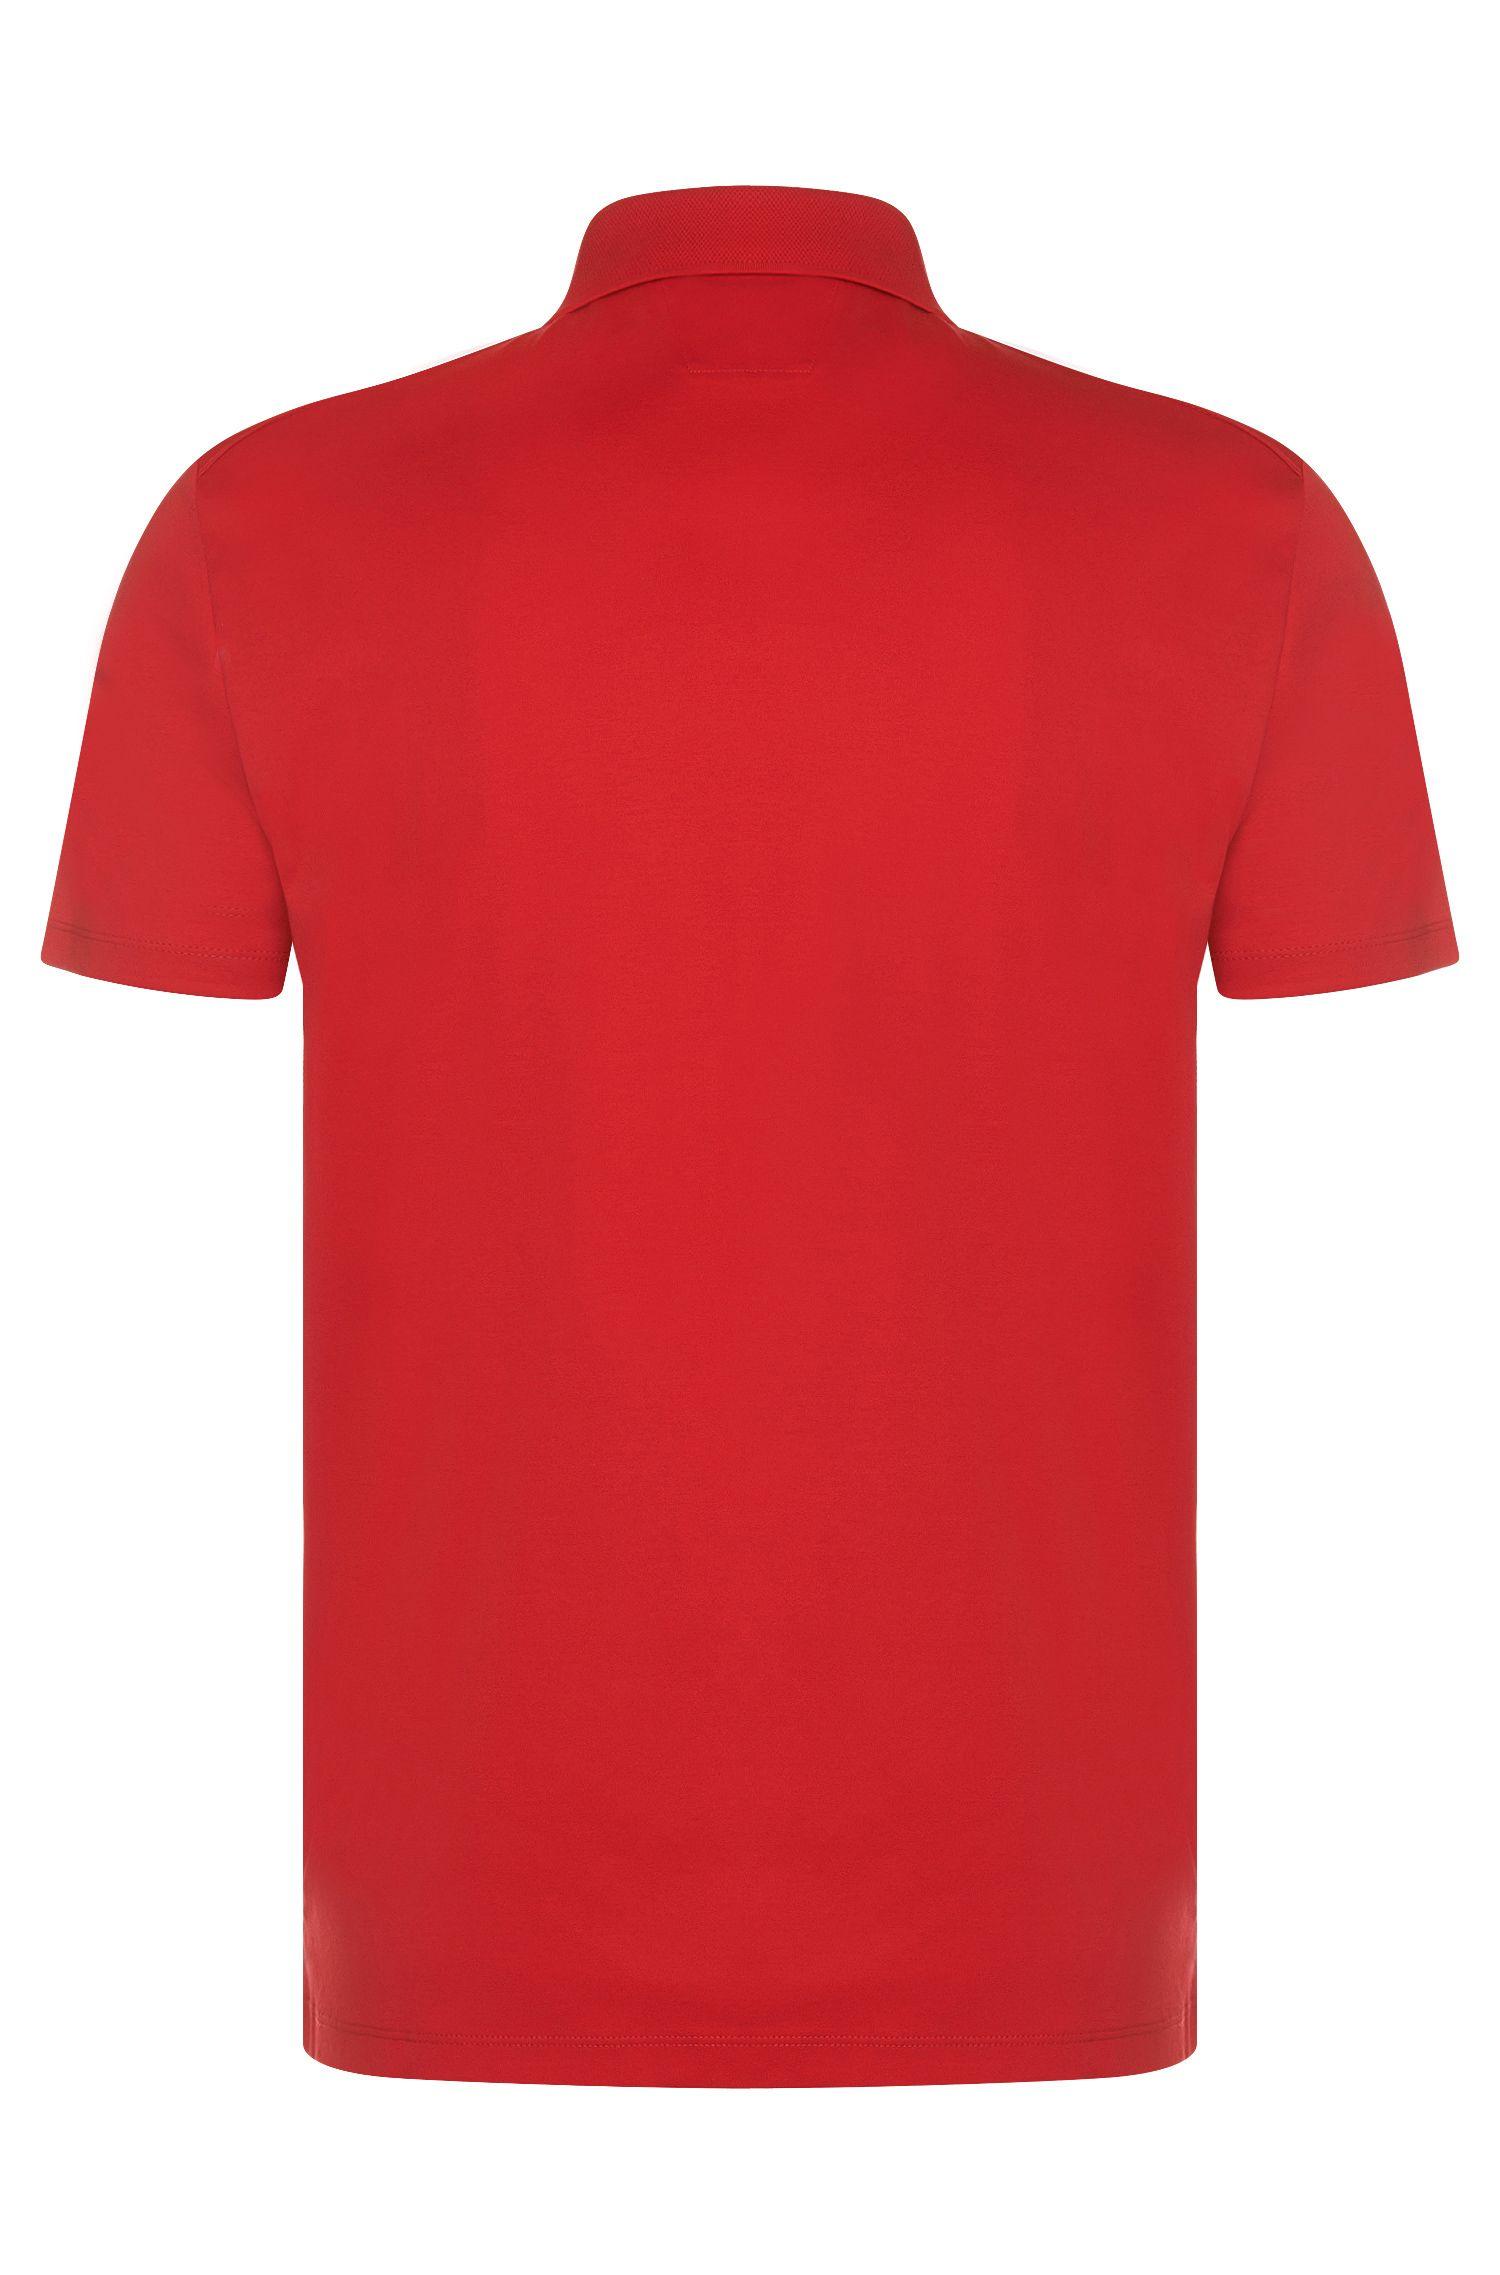 Regular-Fit Tailored Poloshirt aus merzerisierter Baumwolle: 'T-Perry 09'